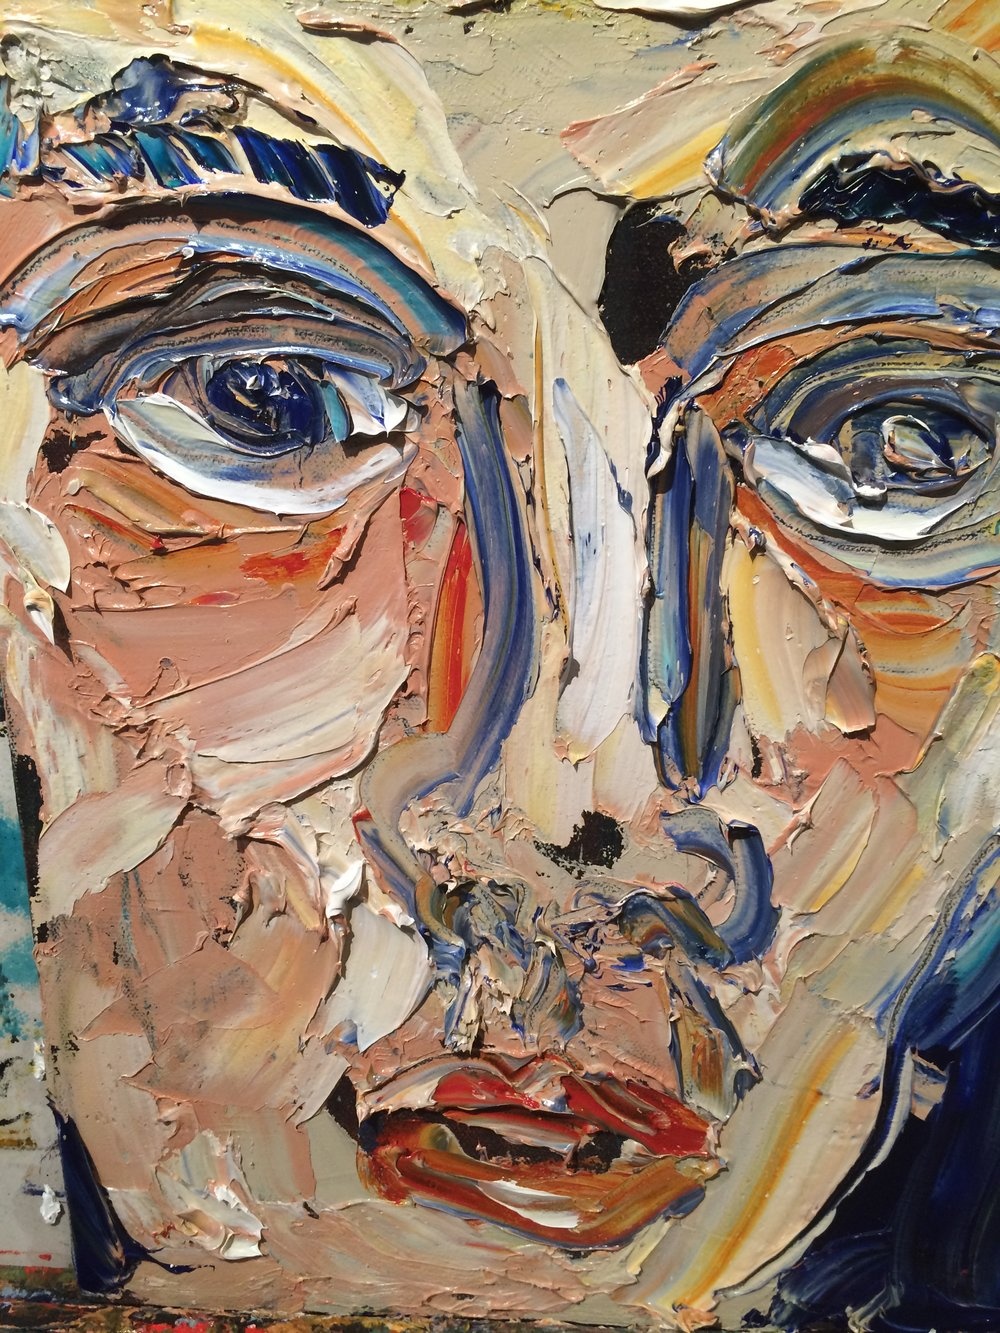 Siobhan - oil on canvas 2016